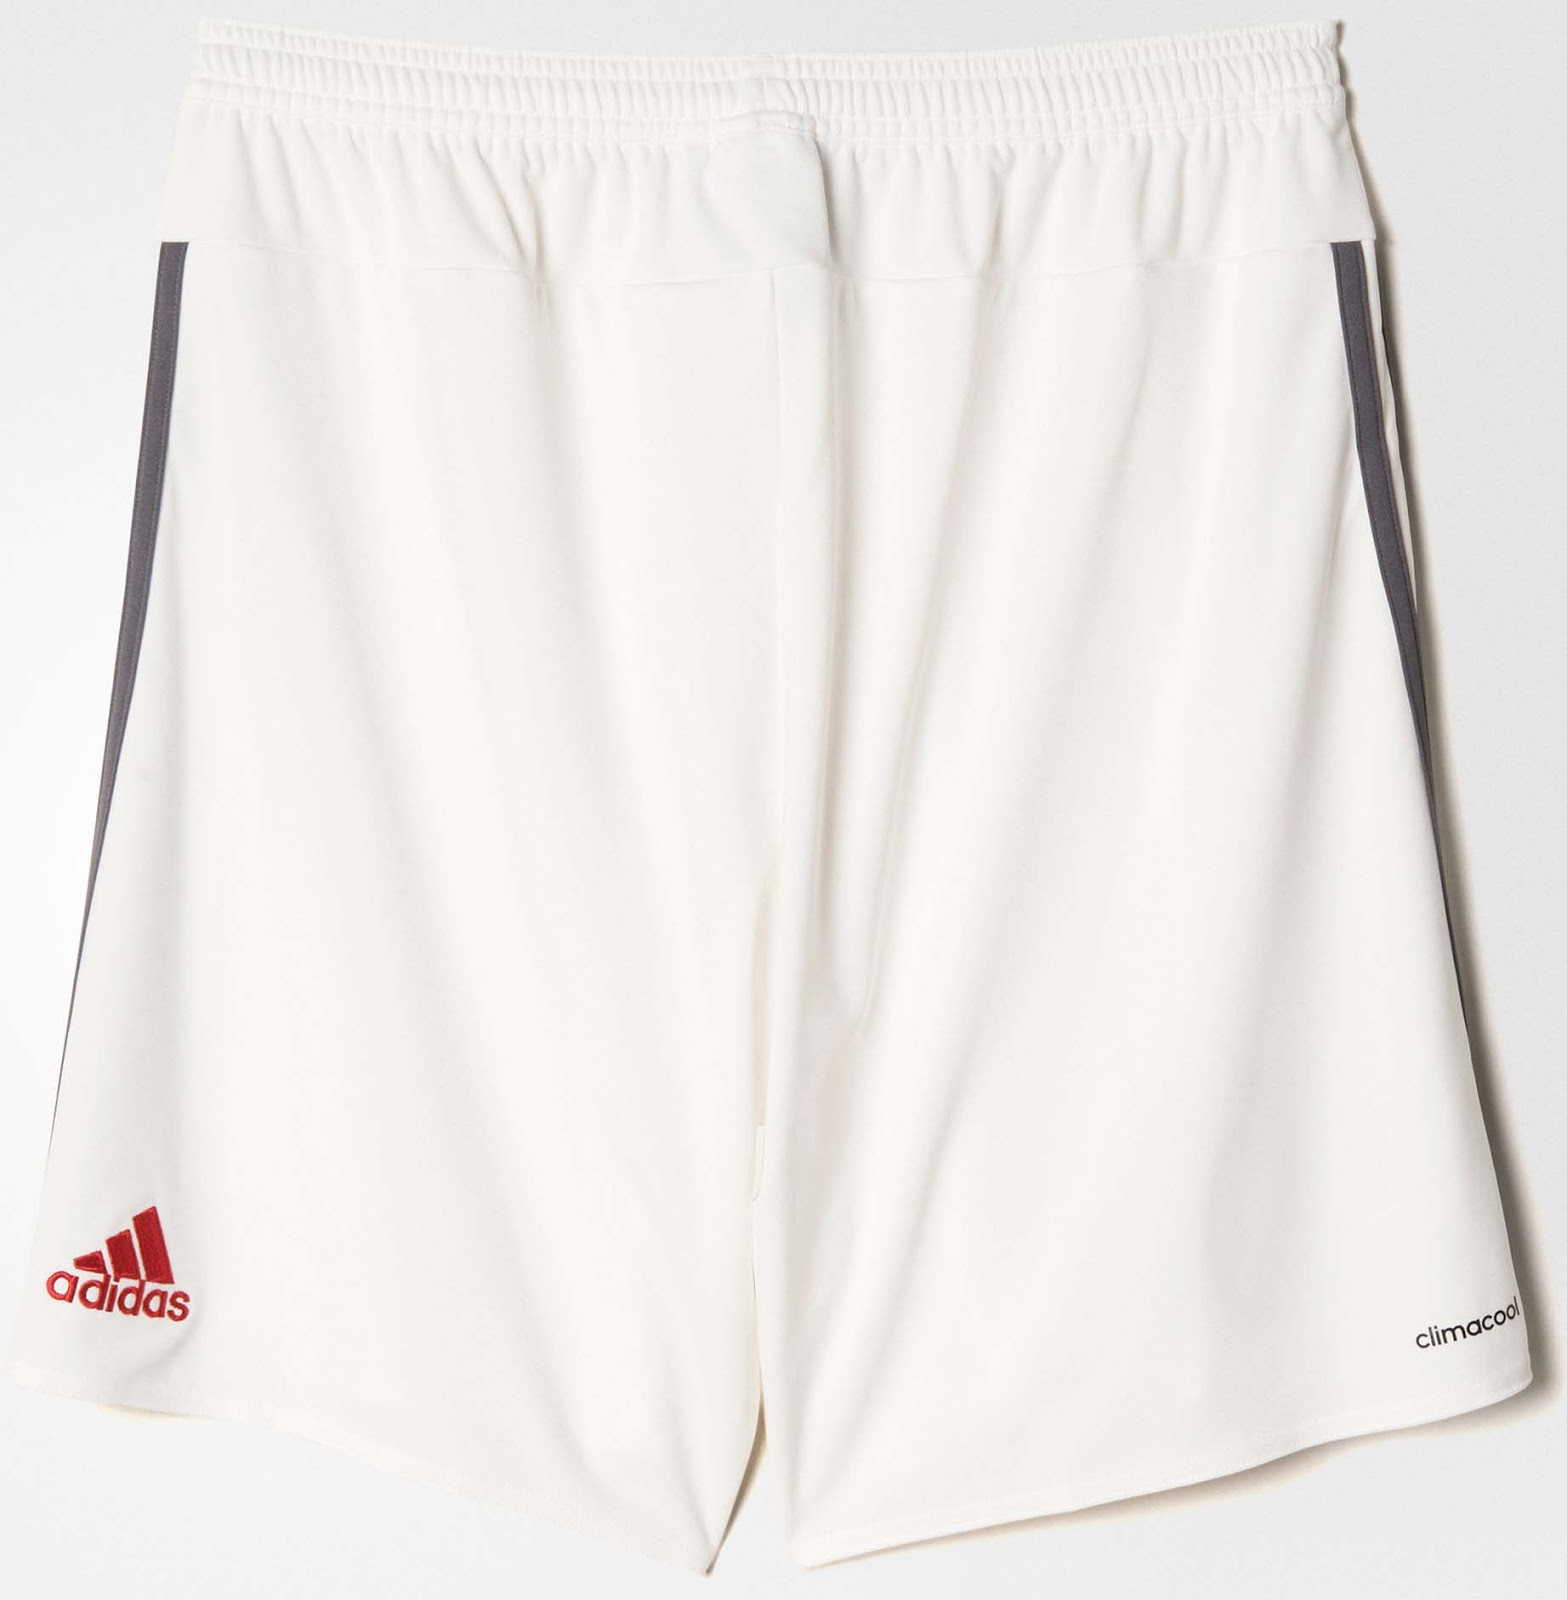 04dbf78766 AC Milan Italy Series A Adidas 15-16 Jersey Shirt Kits   Have a Nice Day !   nicedaysports September 01 2015